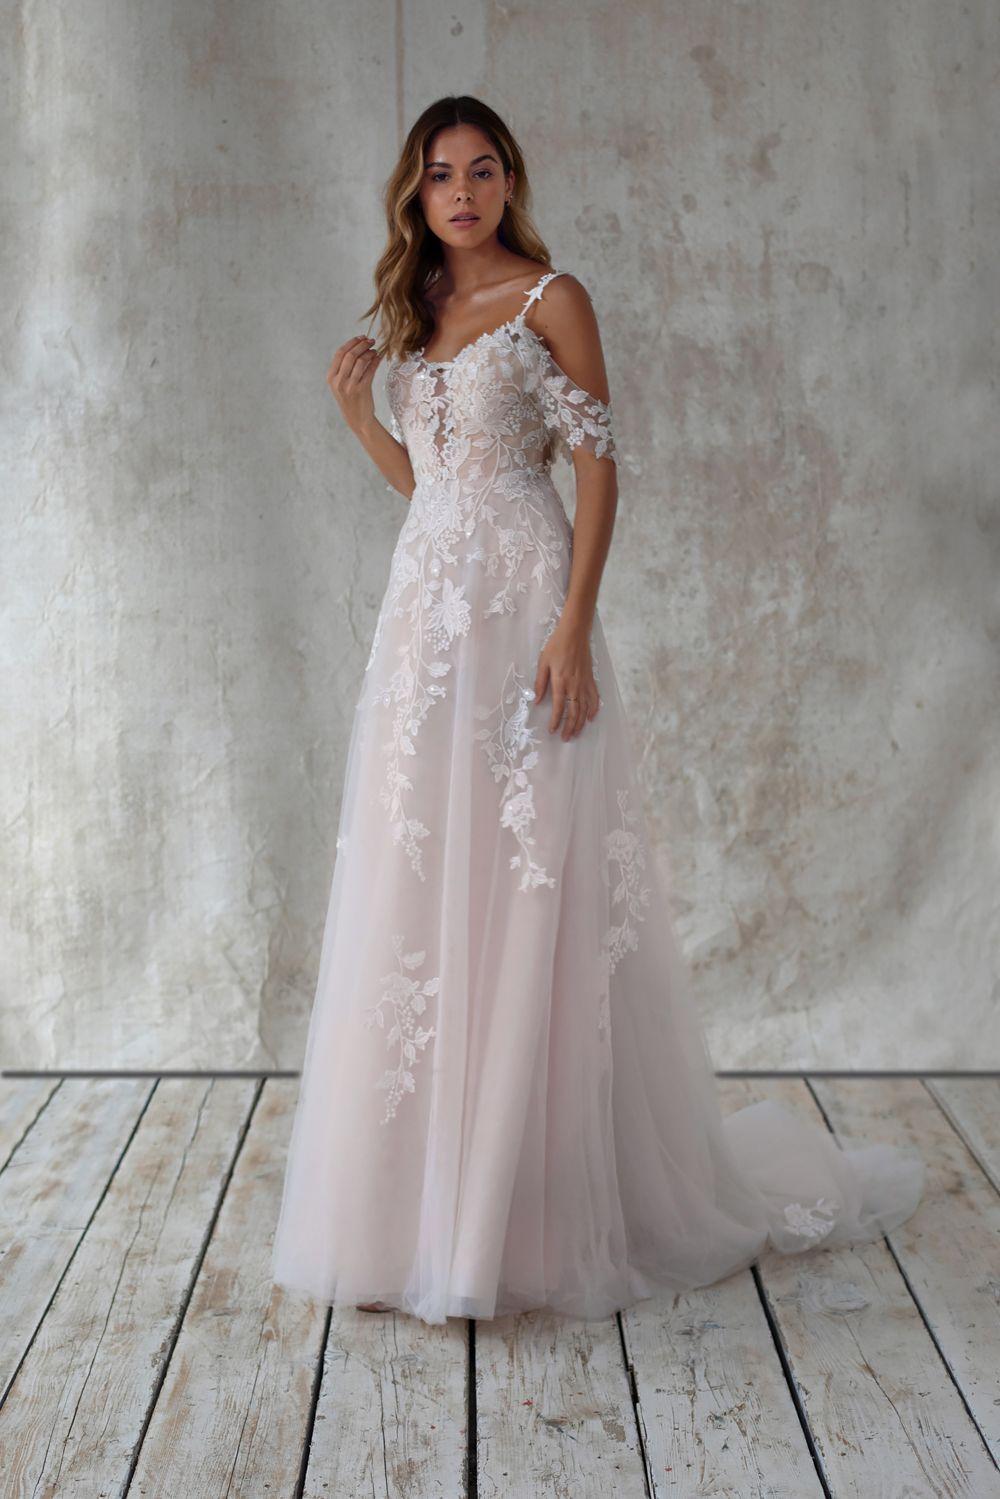 Wedding Dresses Lace Lace Wedding Dresses Wedding Dress Lace Lace Wedding Dress Wedding Dresses Long Sleeve Wedding Dress Long Sleeves Wedding Dress Long Sleeve 43